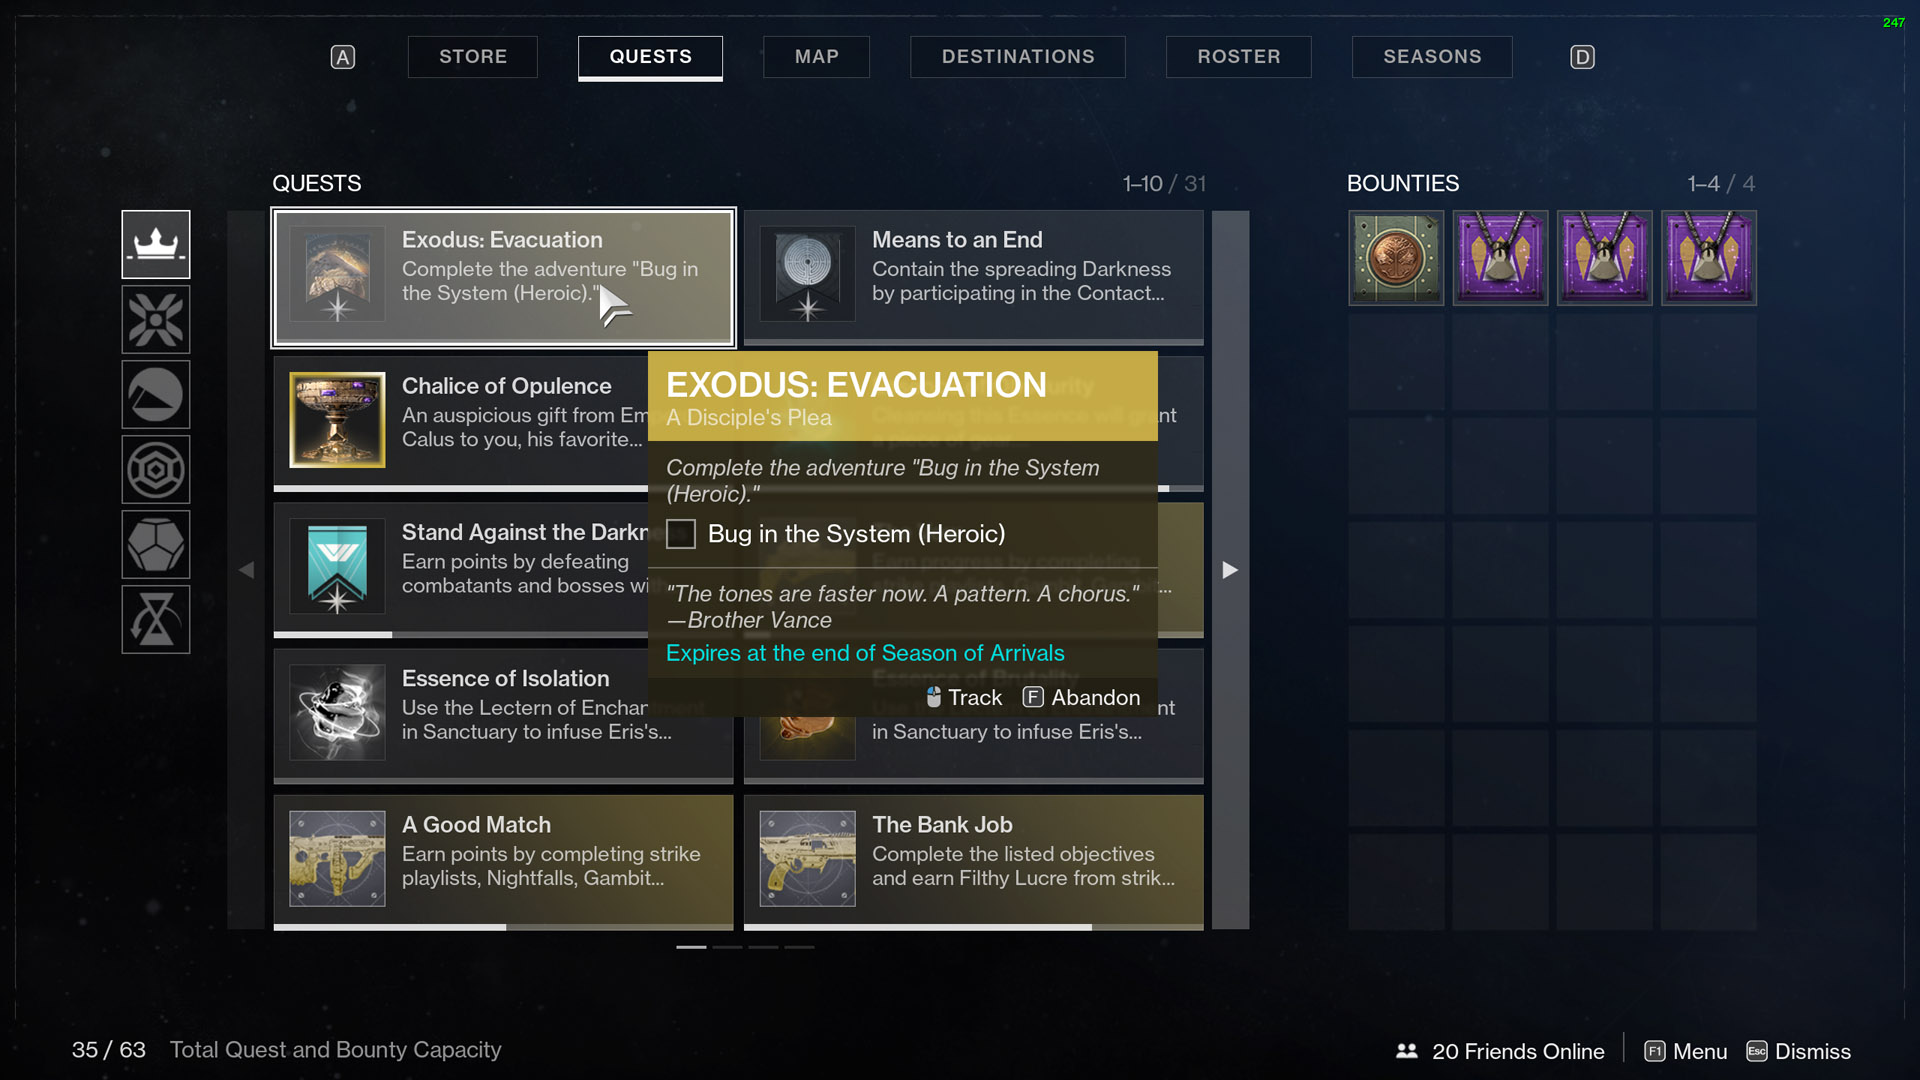 Destiny 2 Exodus Evacuation A Disciple's Plea